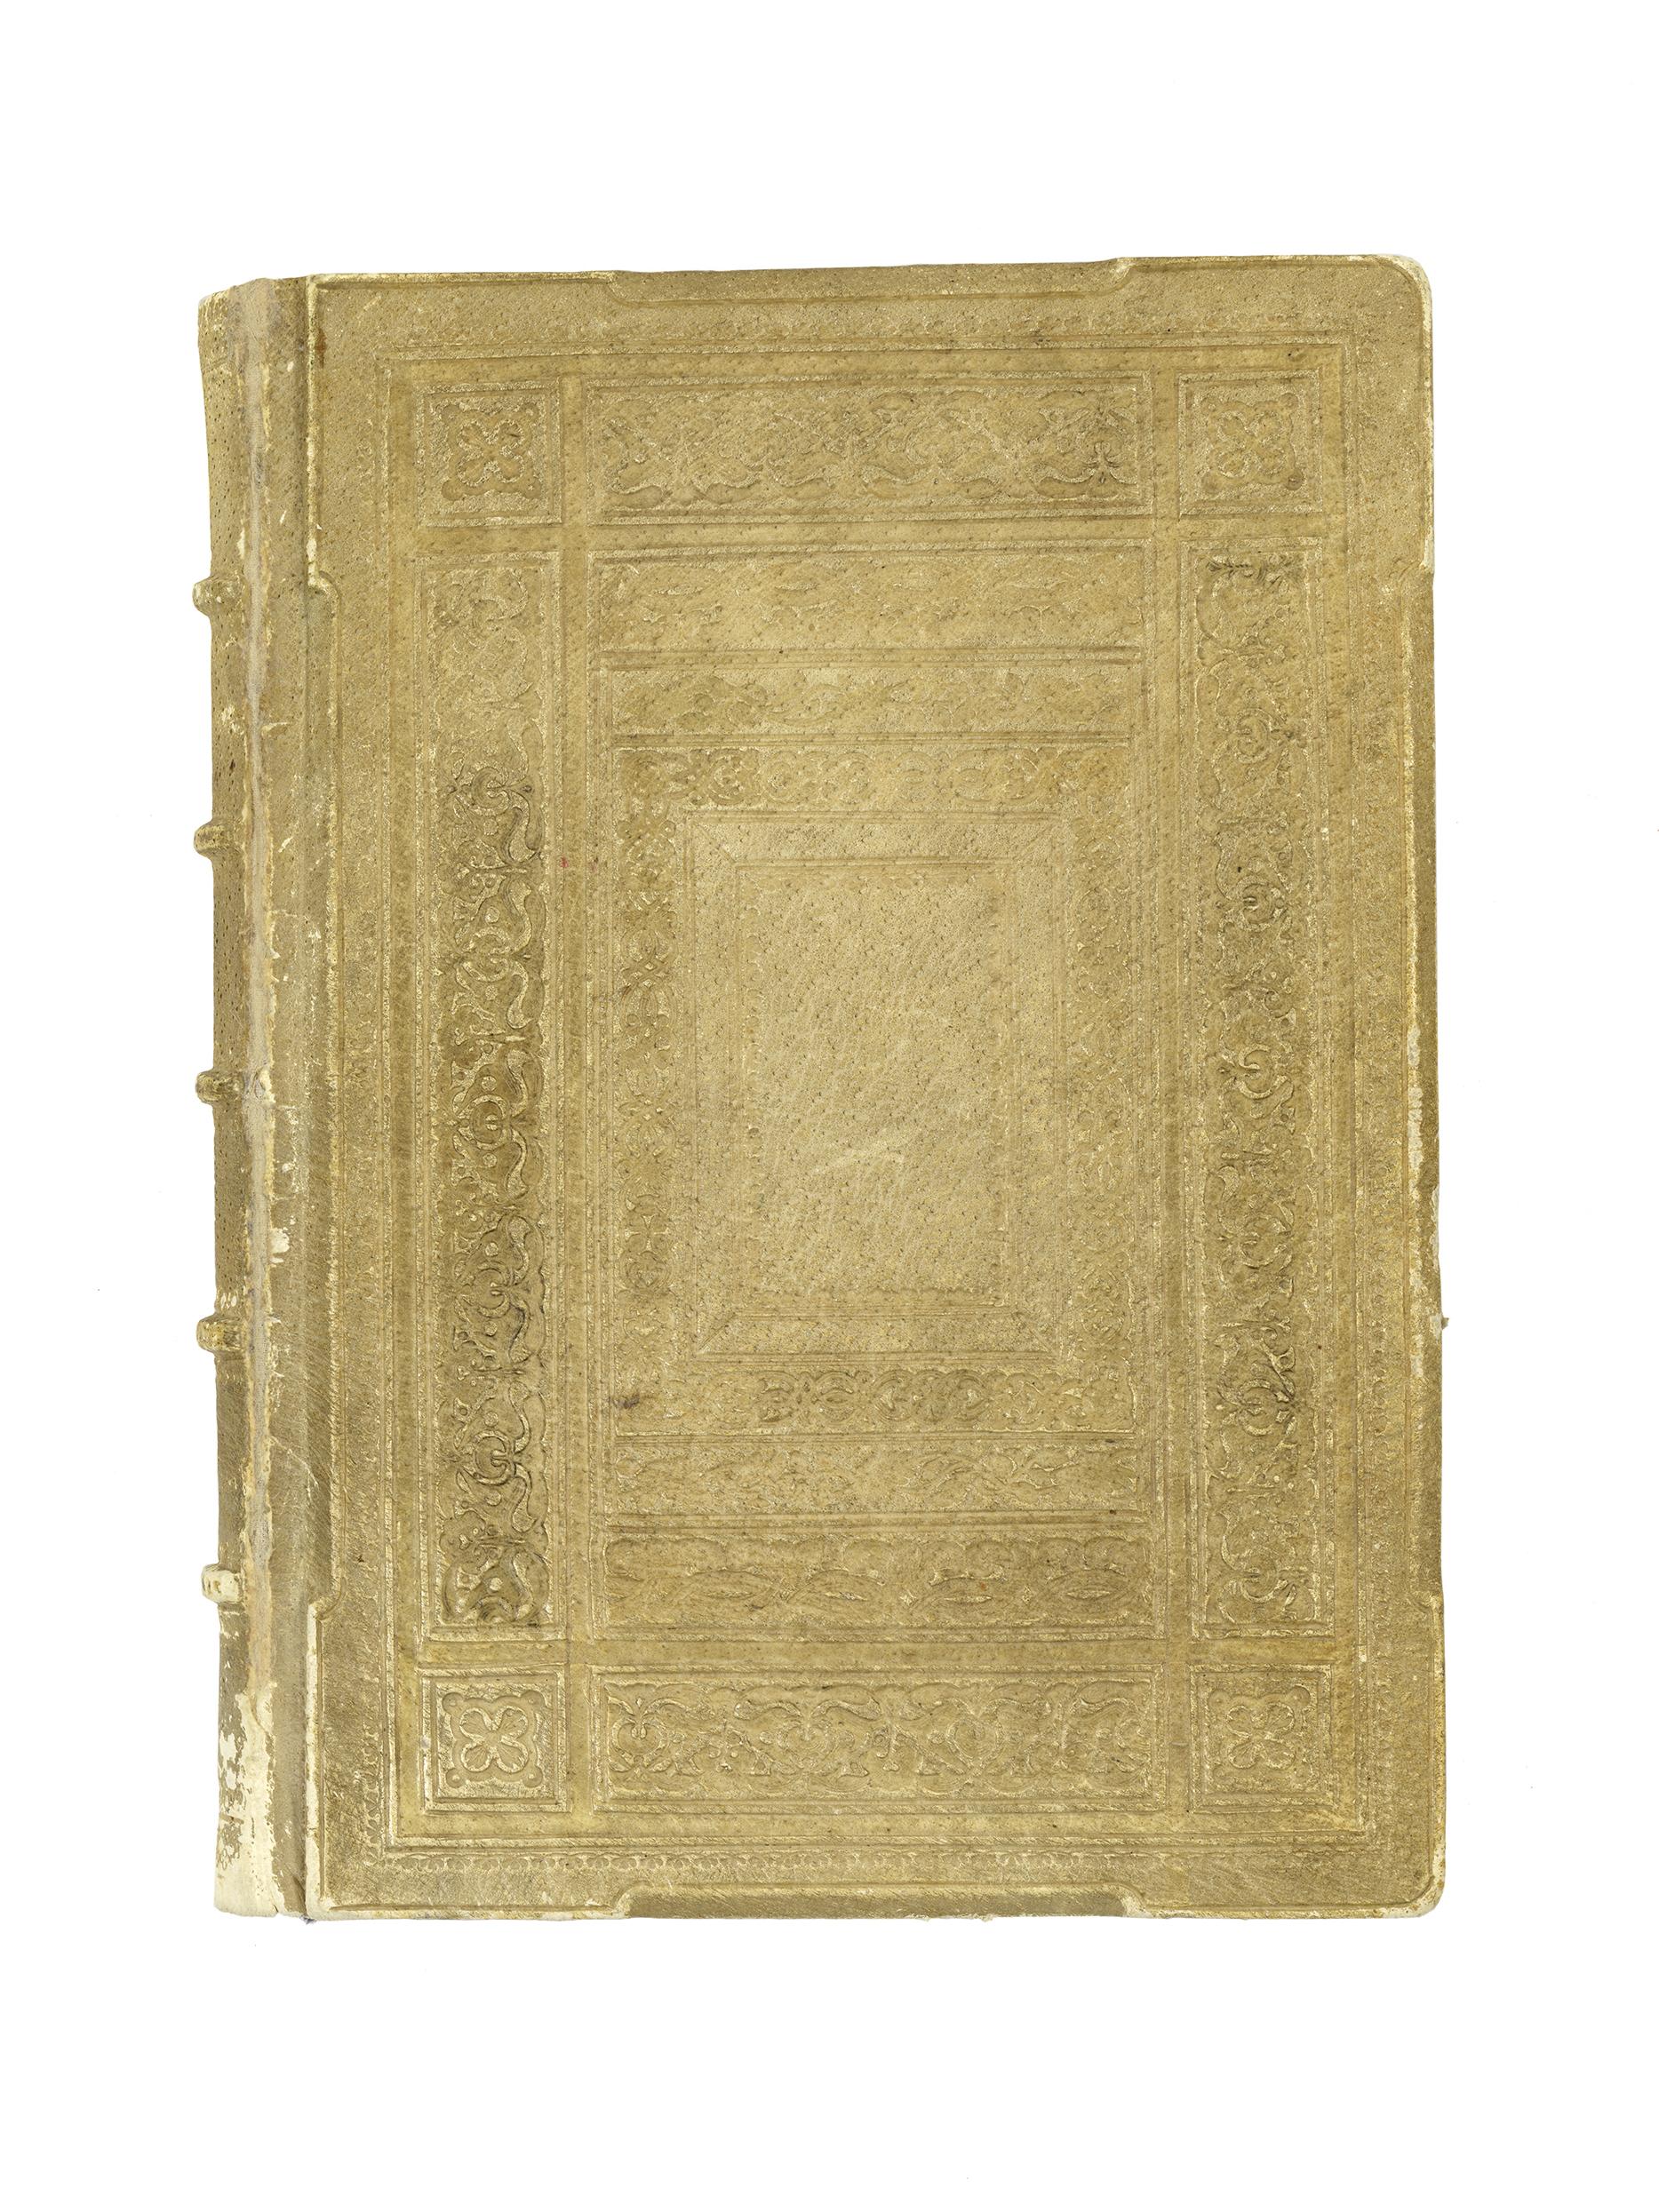 Aliotti Girolamo (1412-1494)_0046.jpg